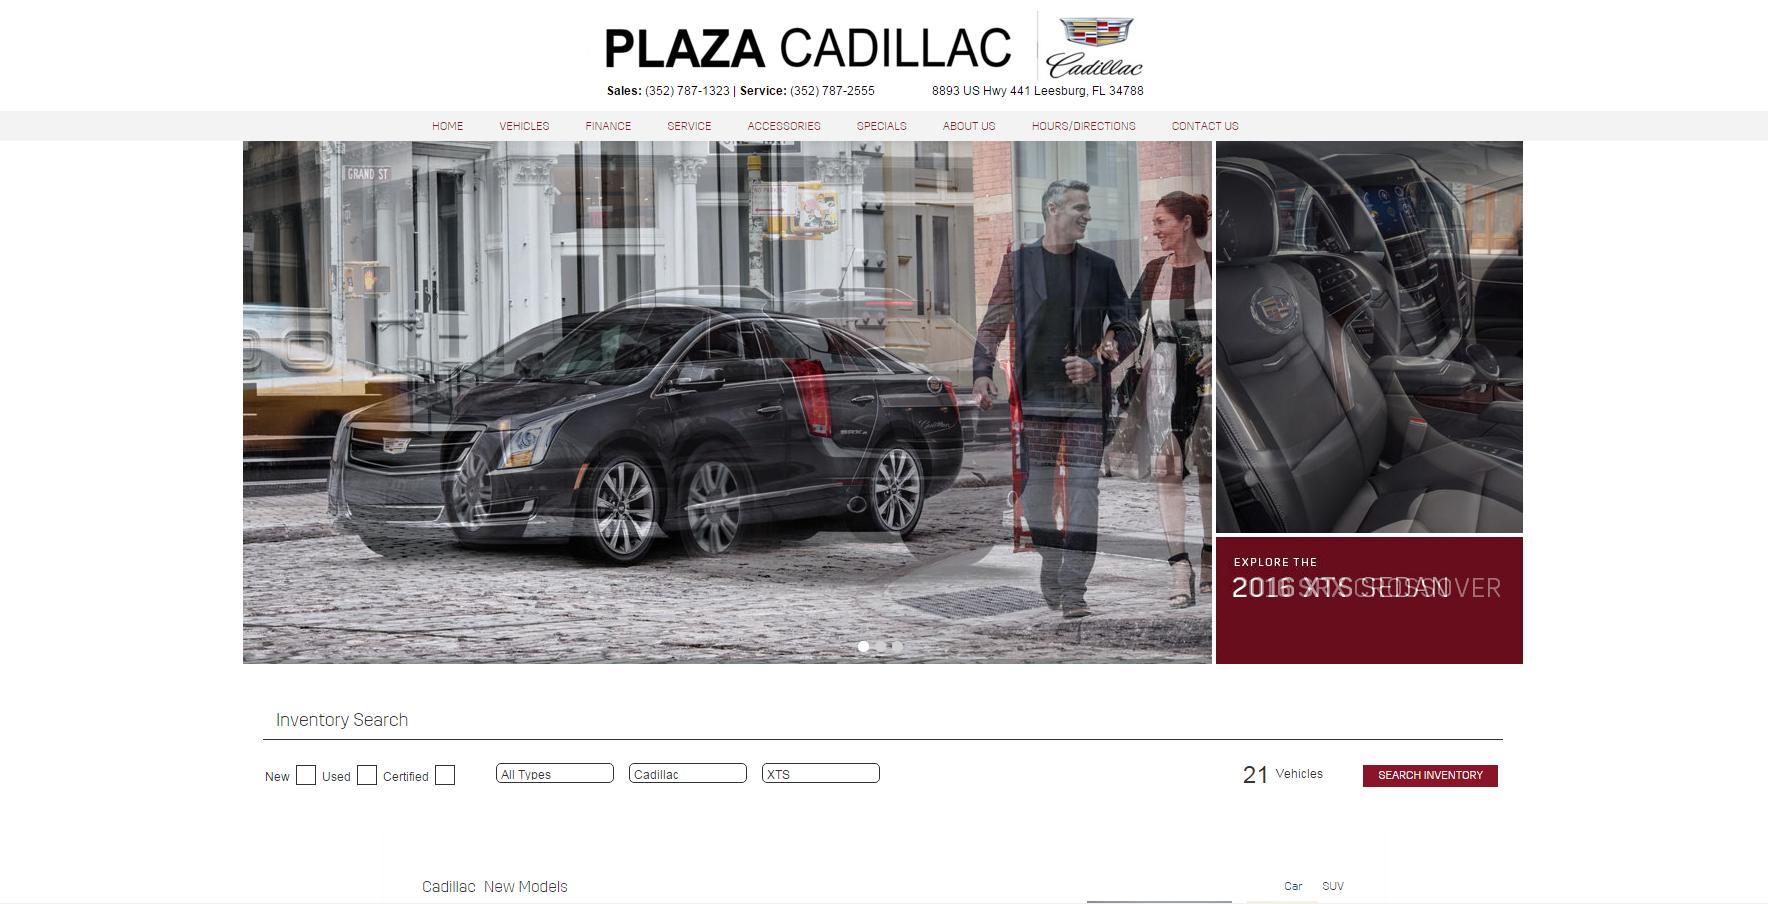 Plaza Cadillac (After) 1.1